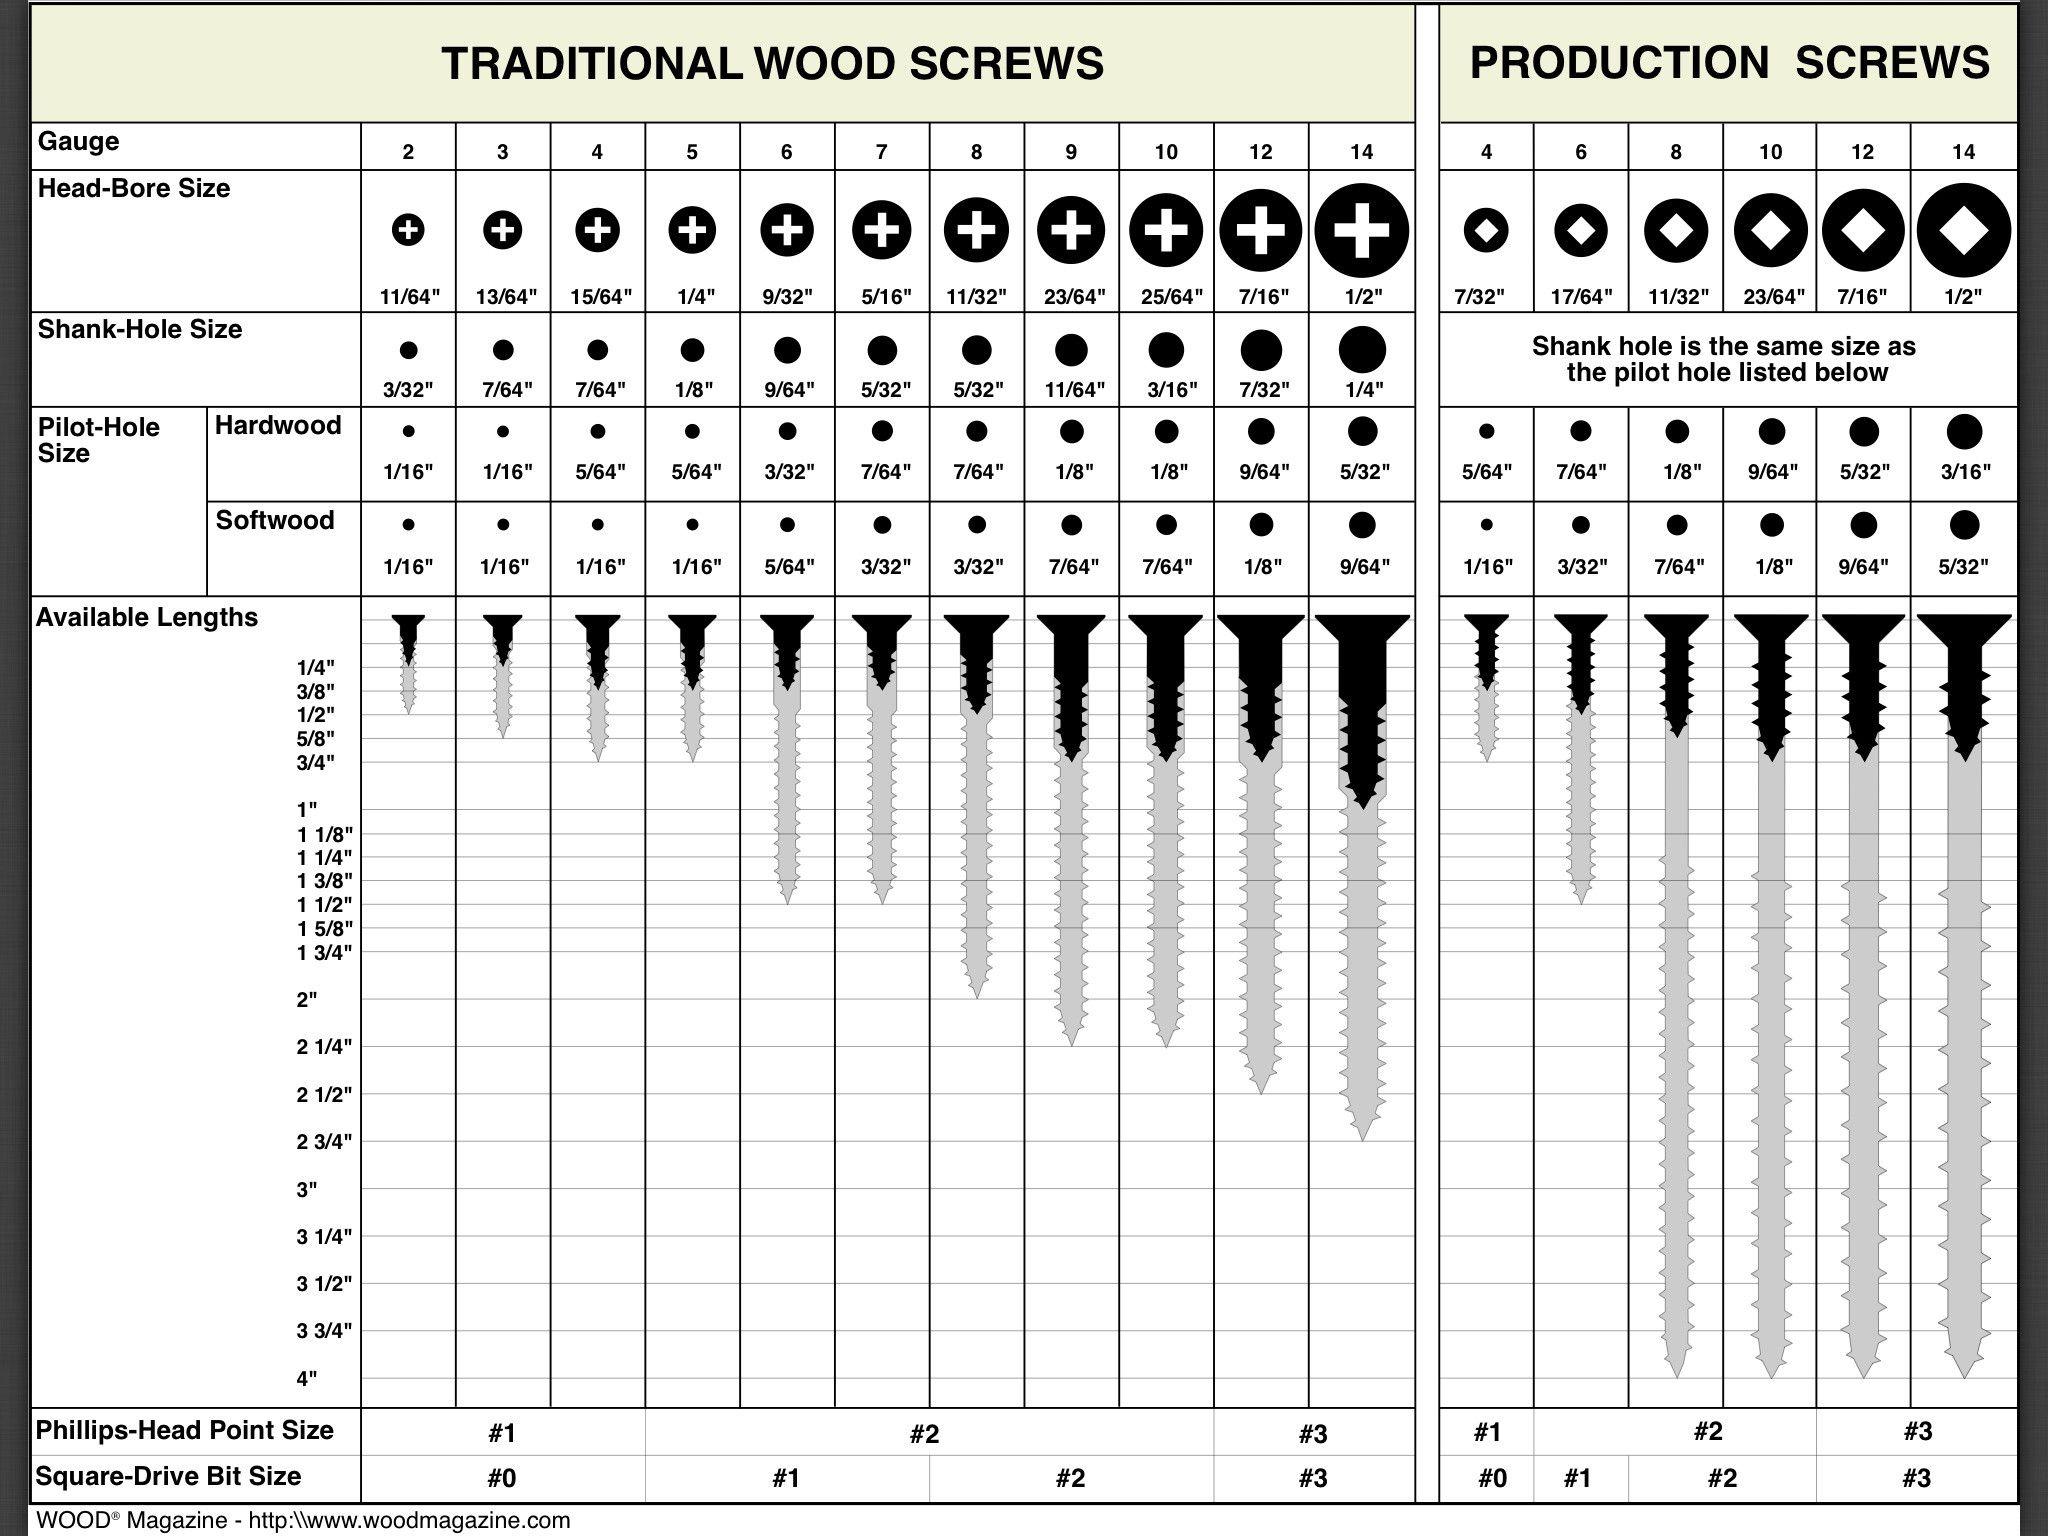 Wood magazines screw chart traditional wood production screws wood magazines screw chart traditional wood production screws imgur nvjuhfo Images